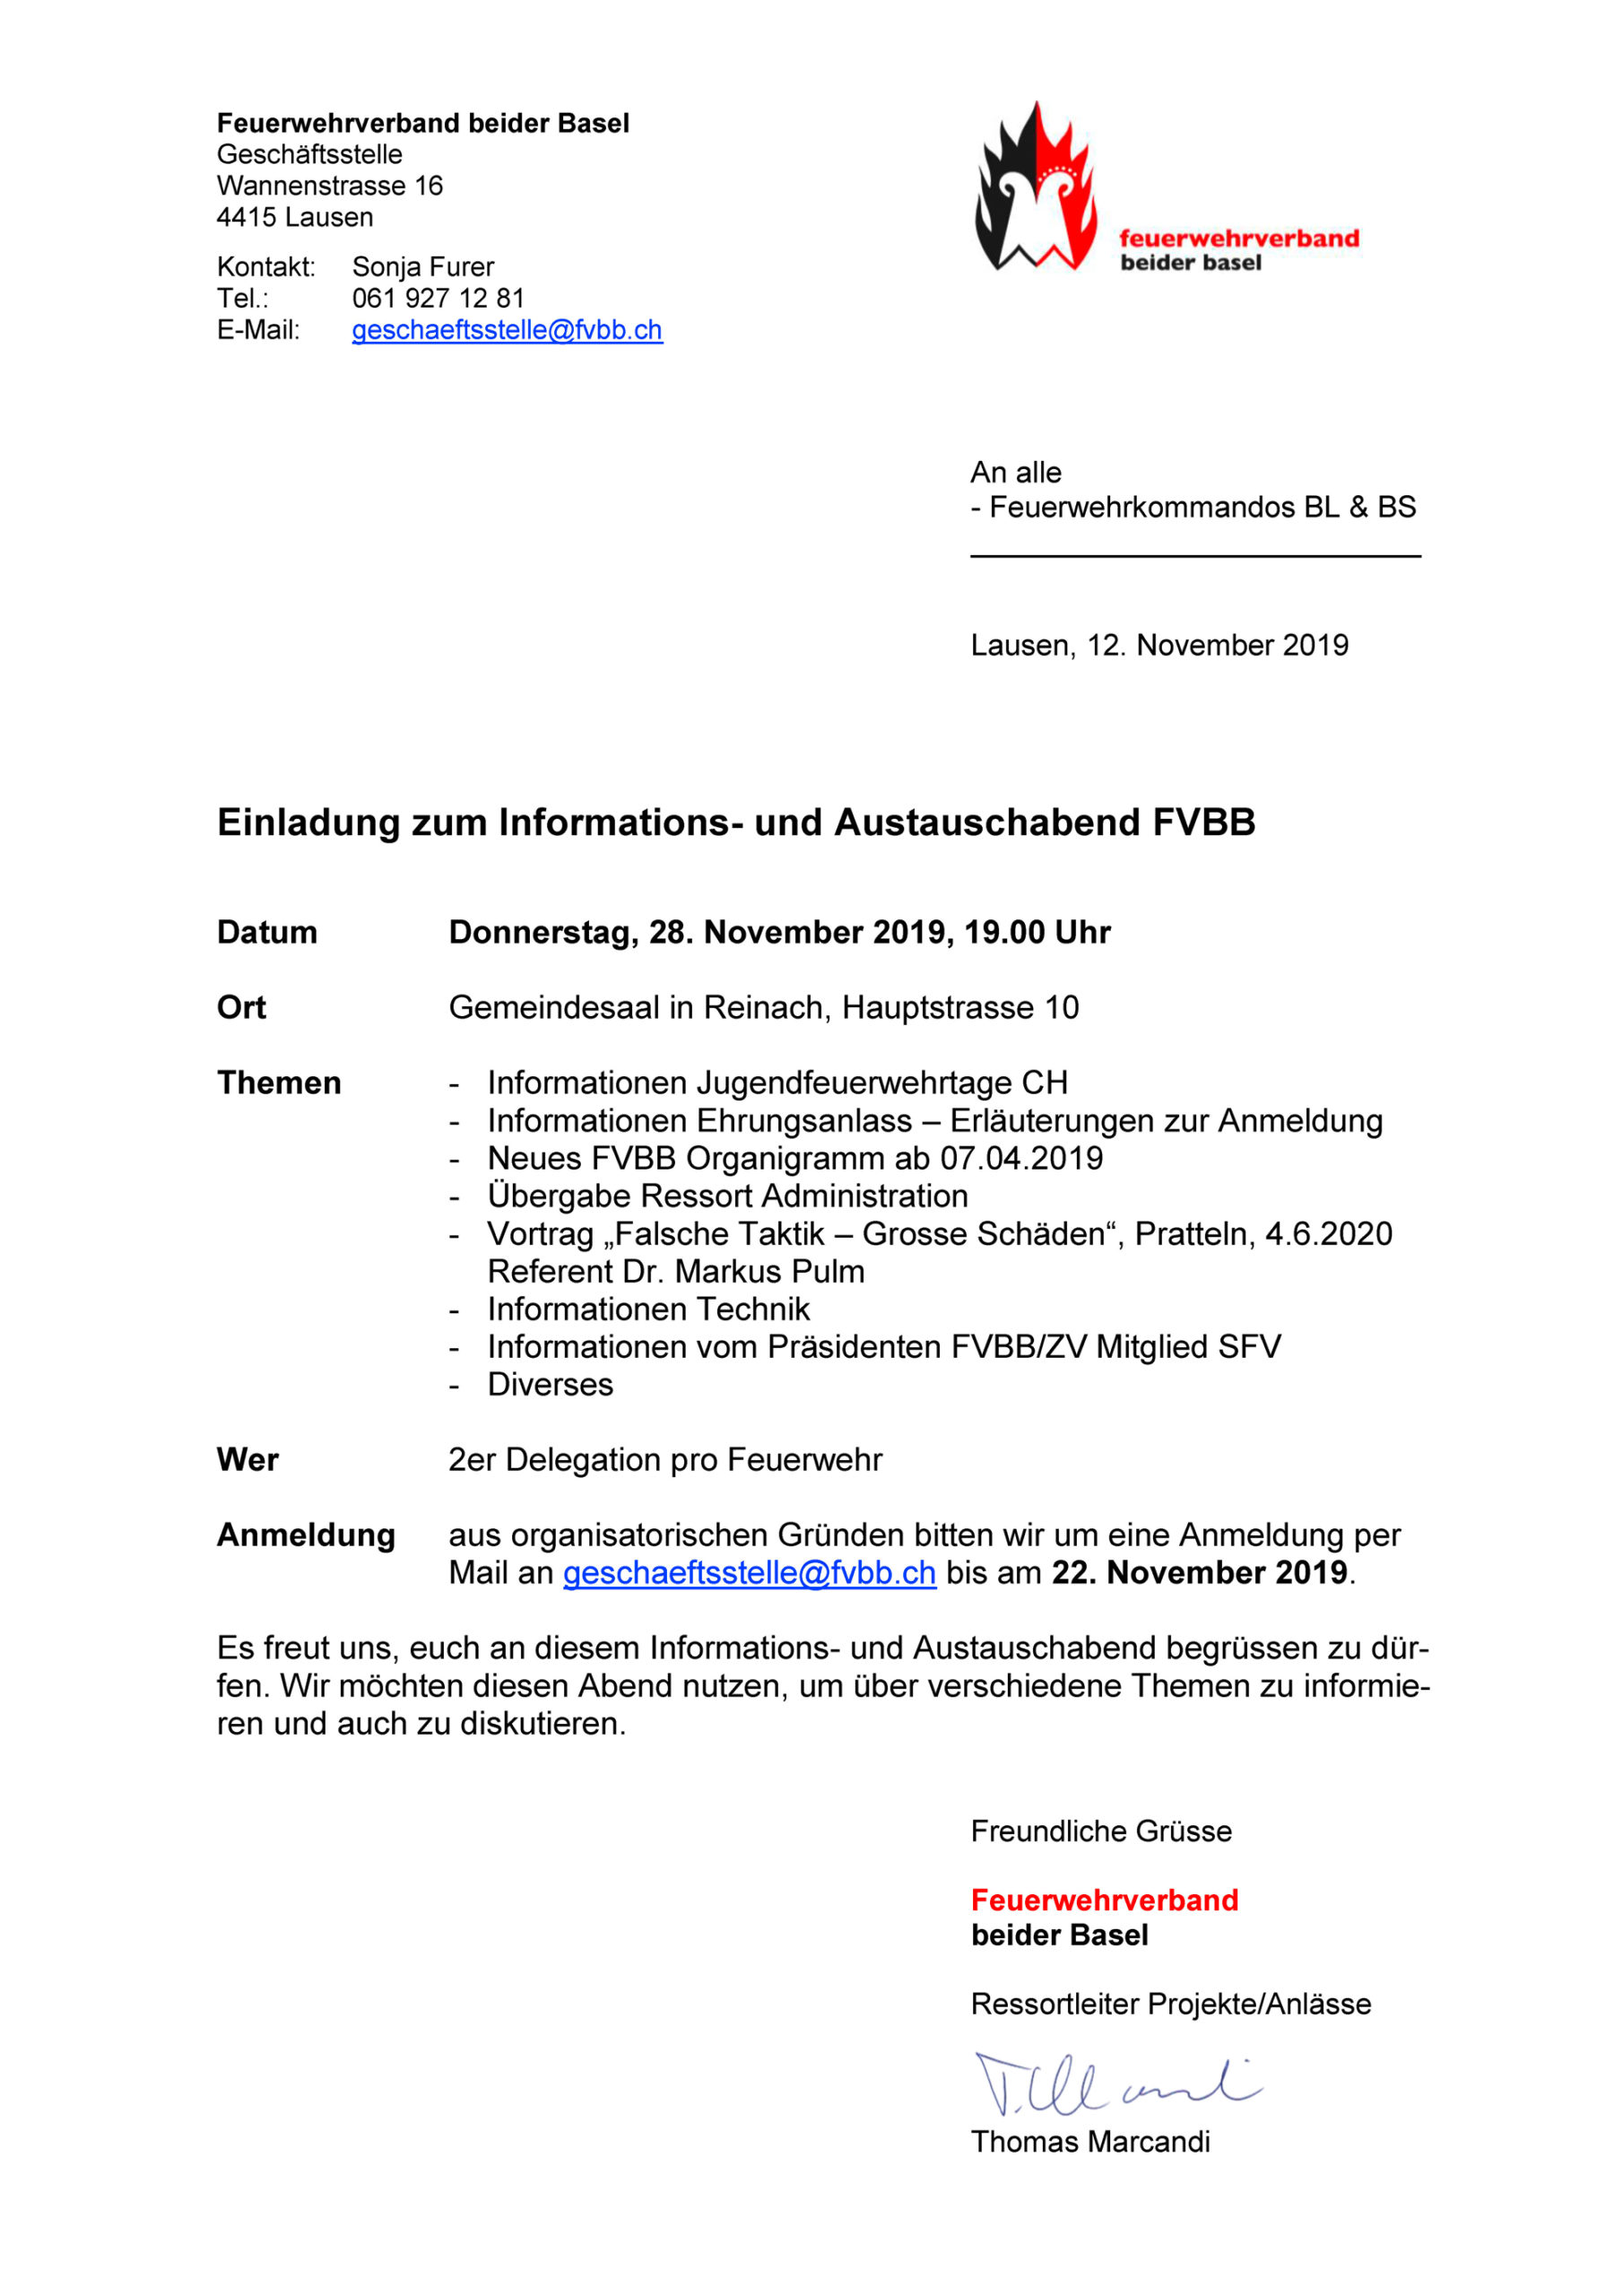 Info-Abend FVBB am 28. November 2019